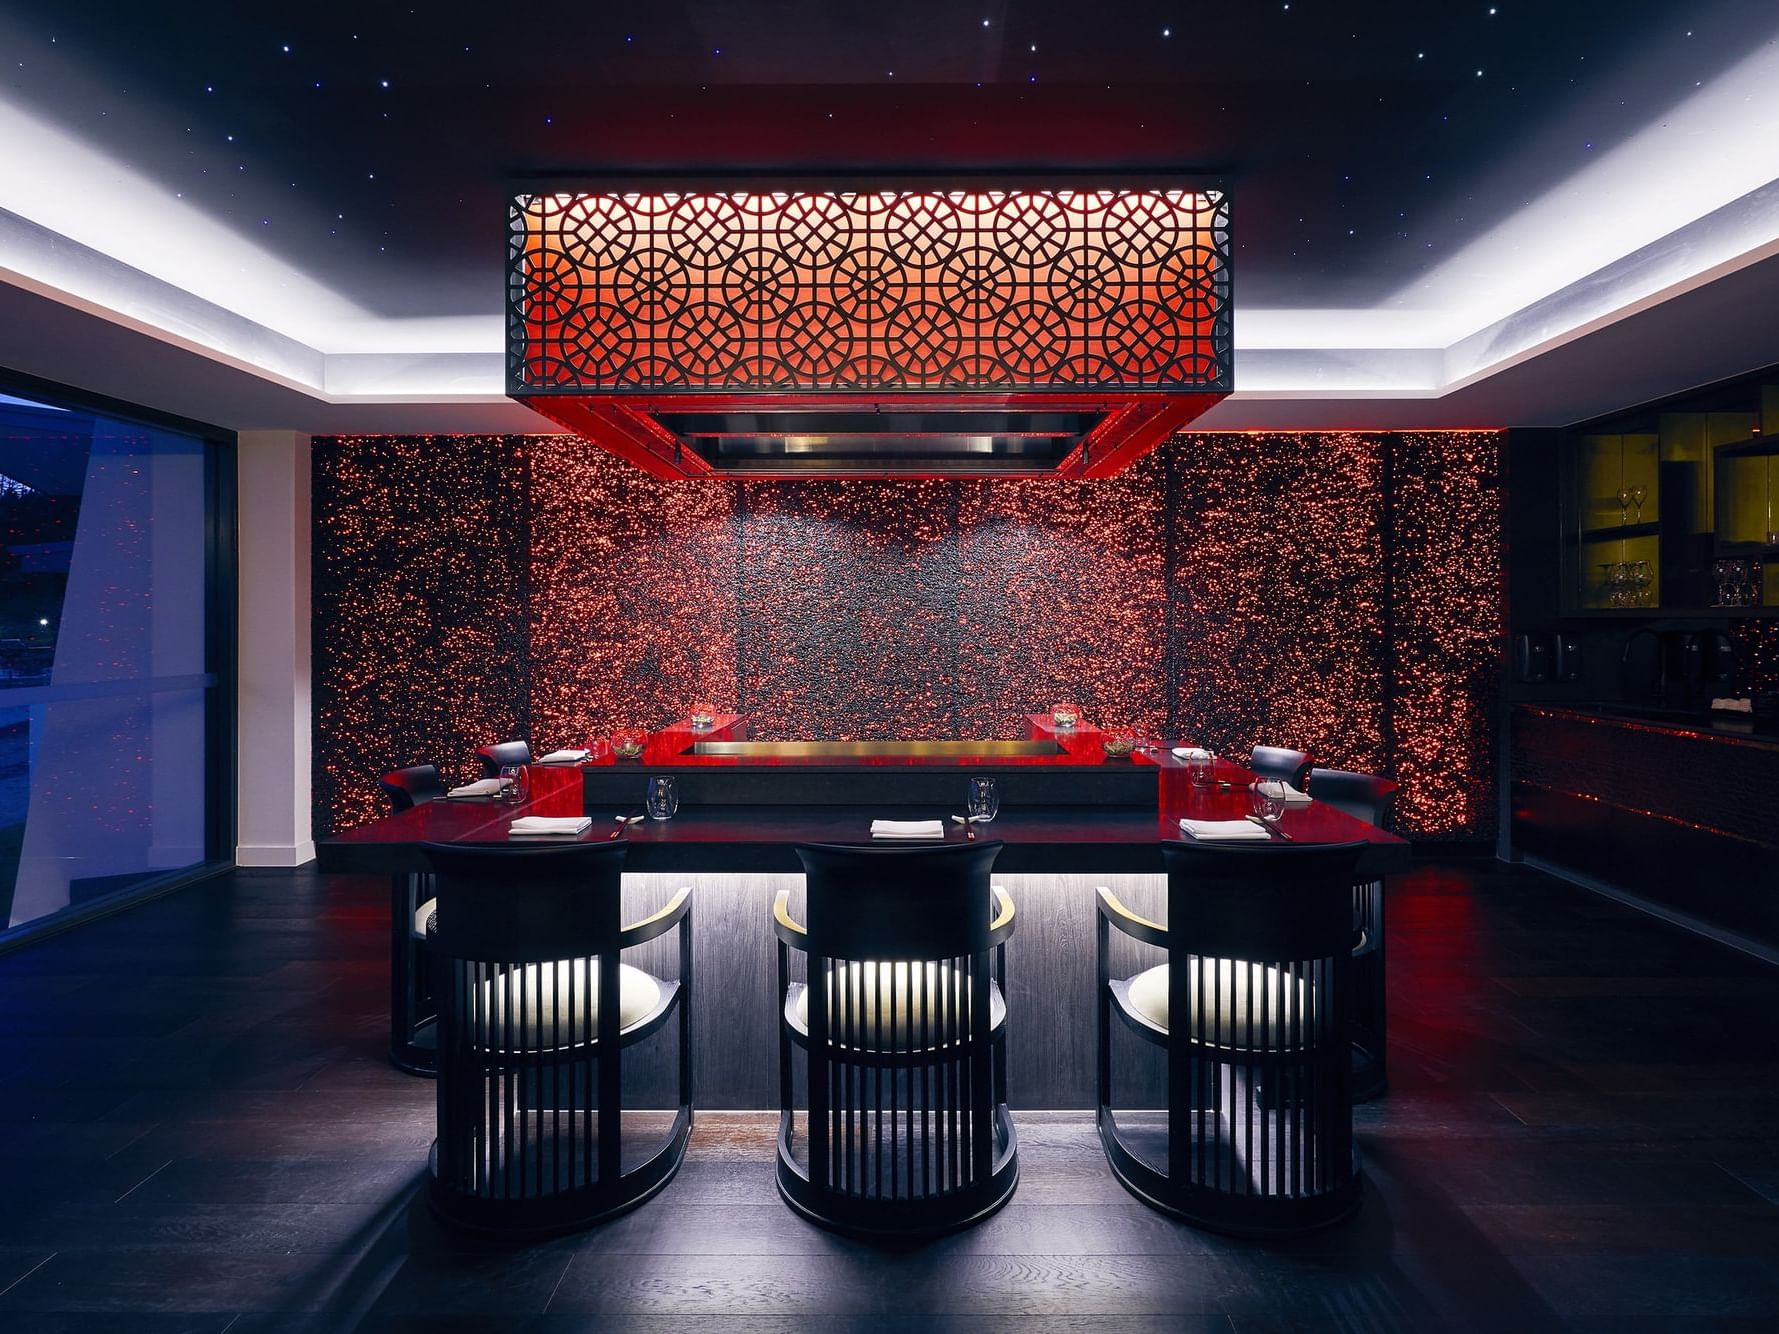 Bar counter in Infinity Restaurant at Daydream Island Resort